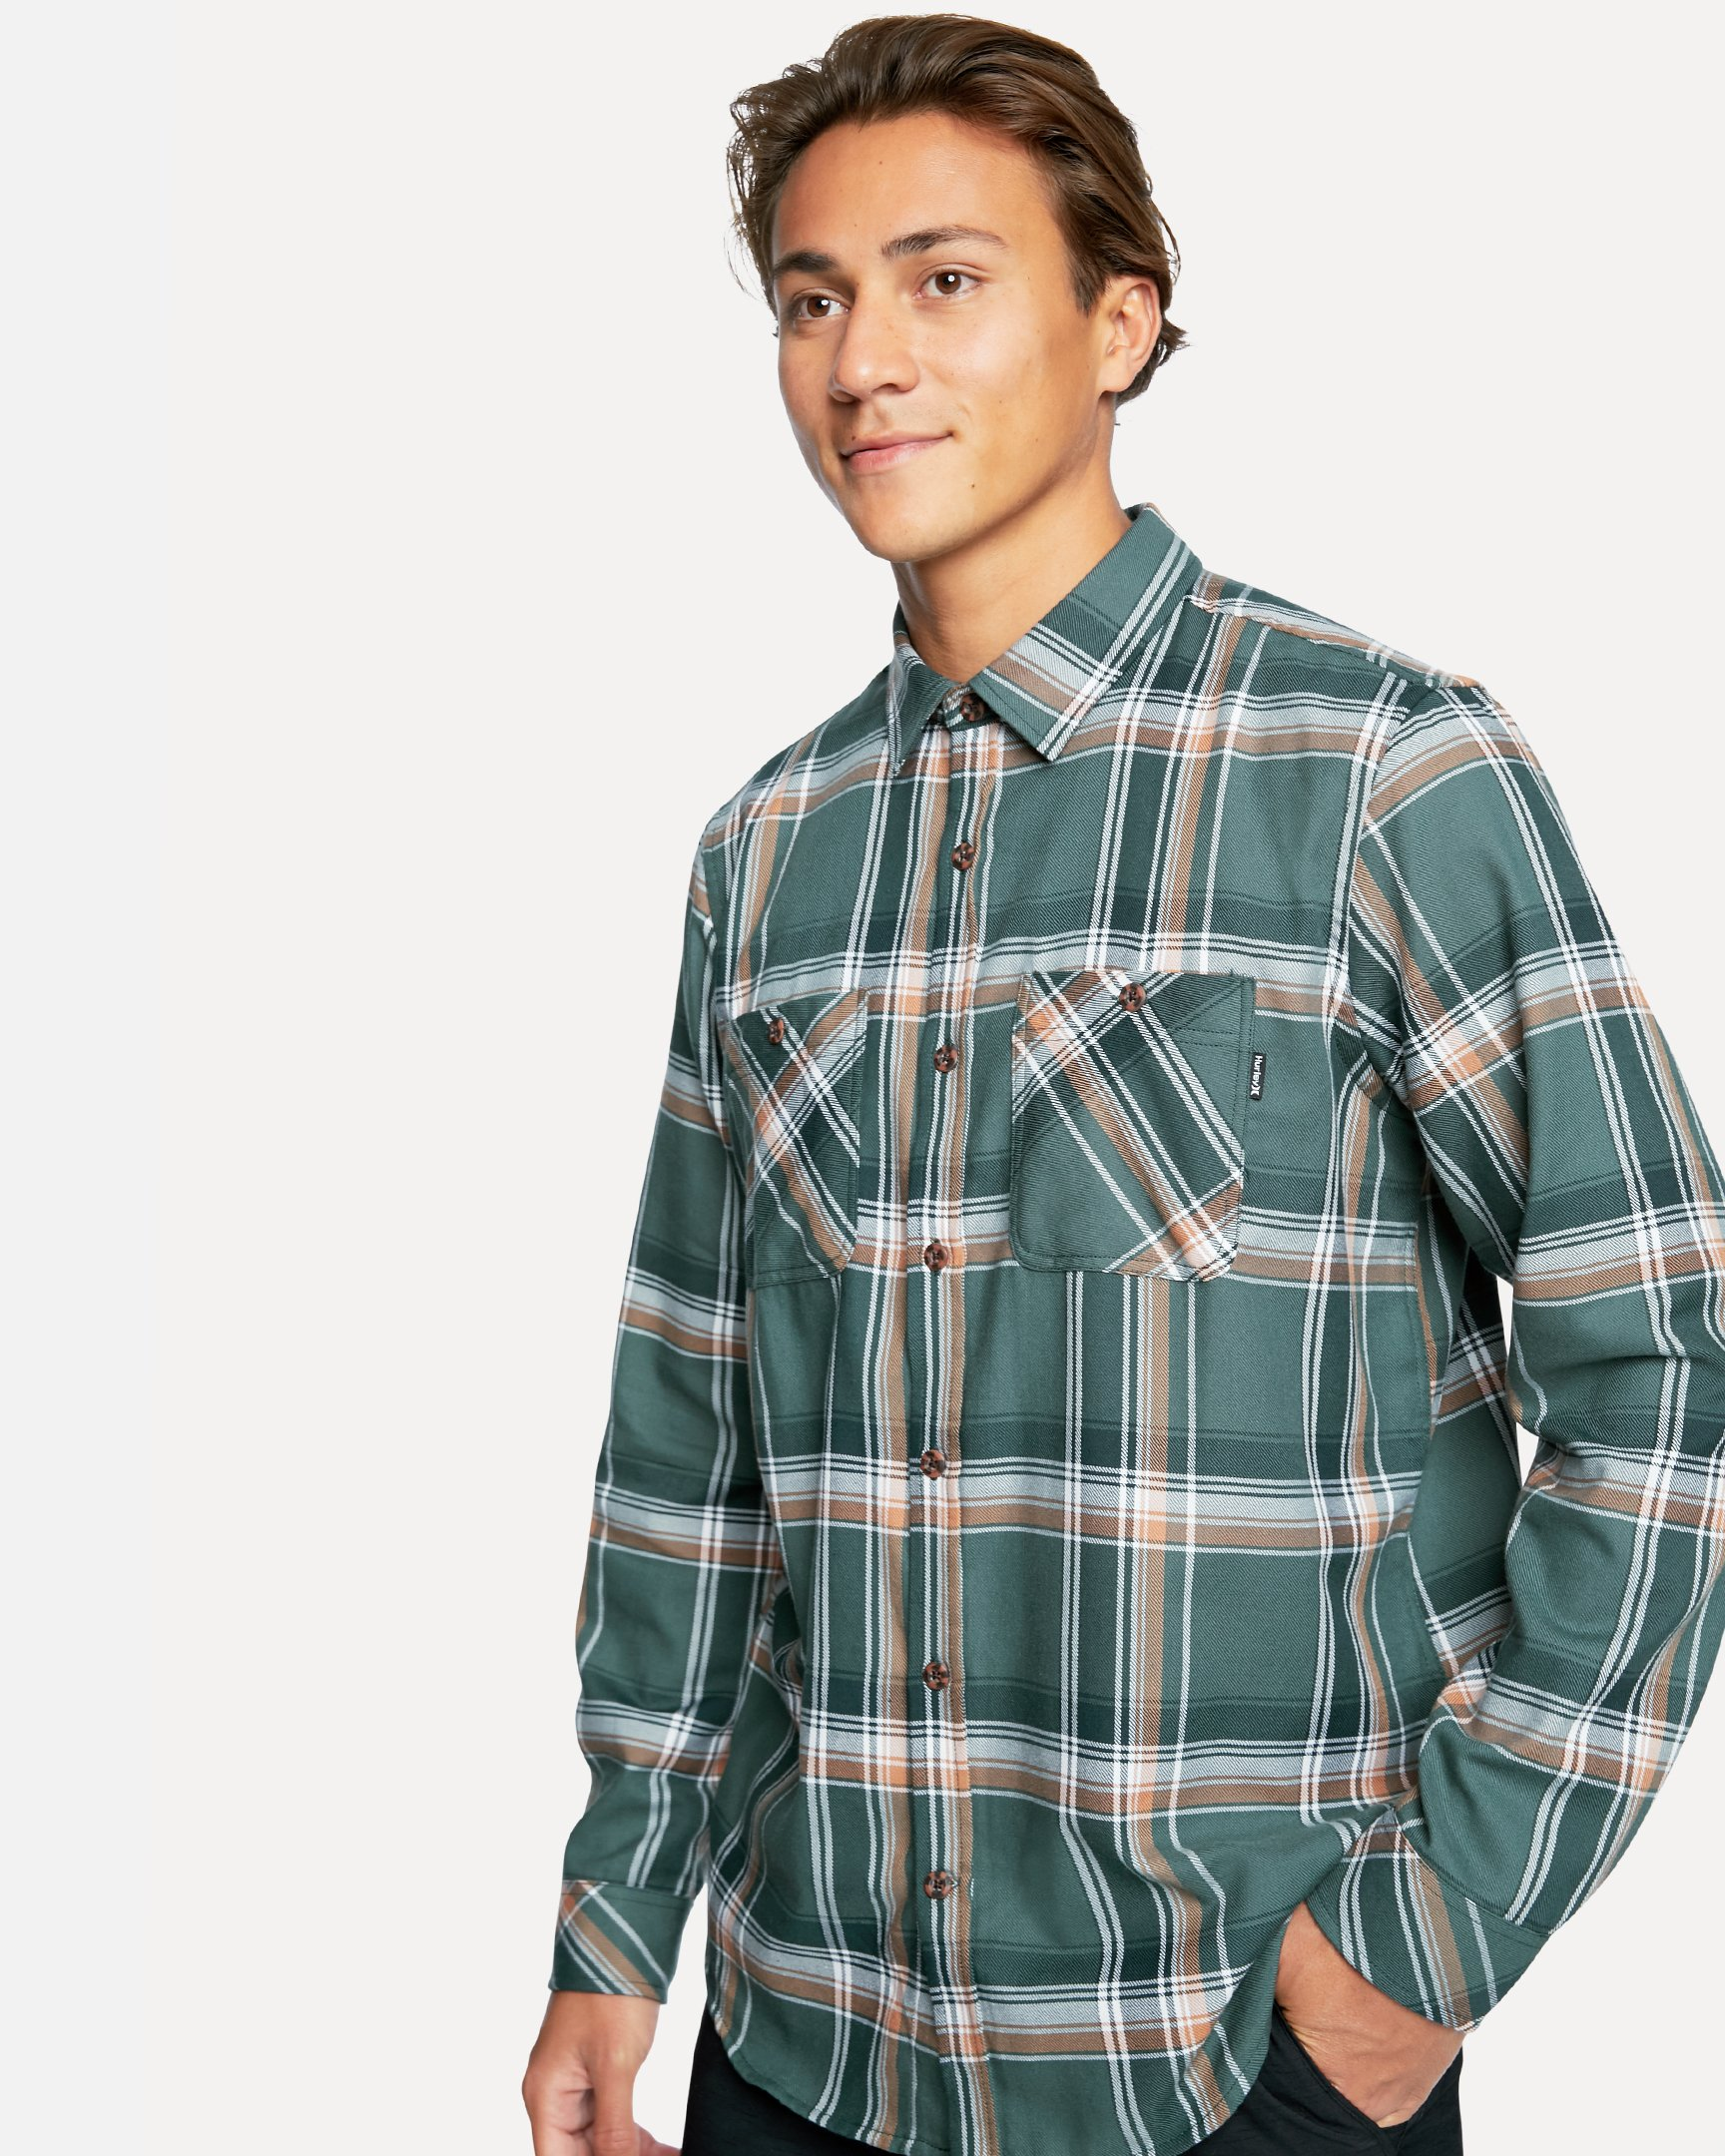 Men's Dri-Fit Hunter Flannel Long Sleeve T-Shirt in Vintage Green, Size Medium